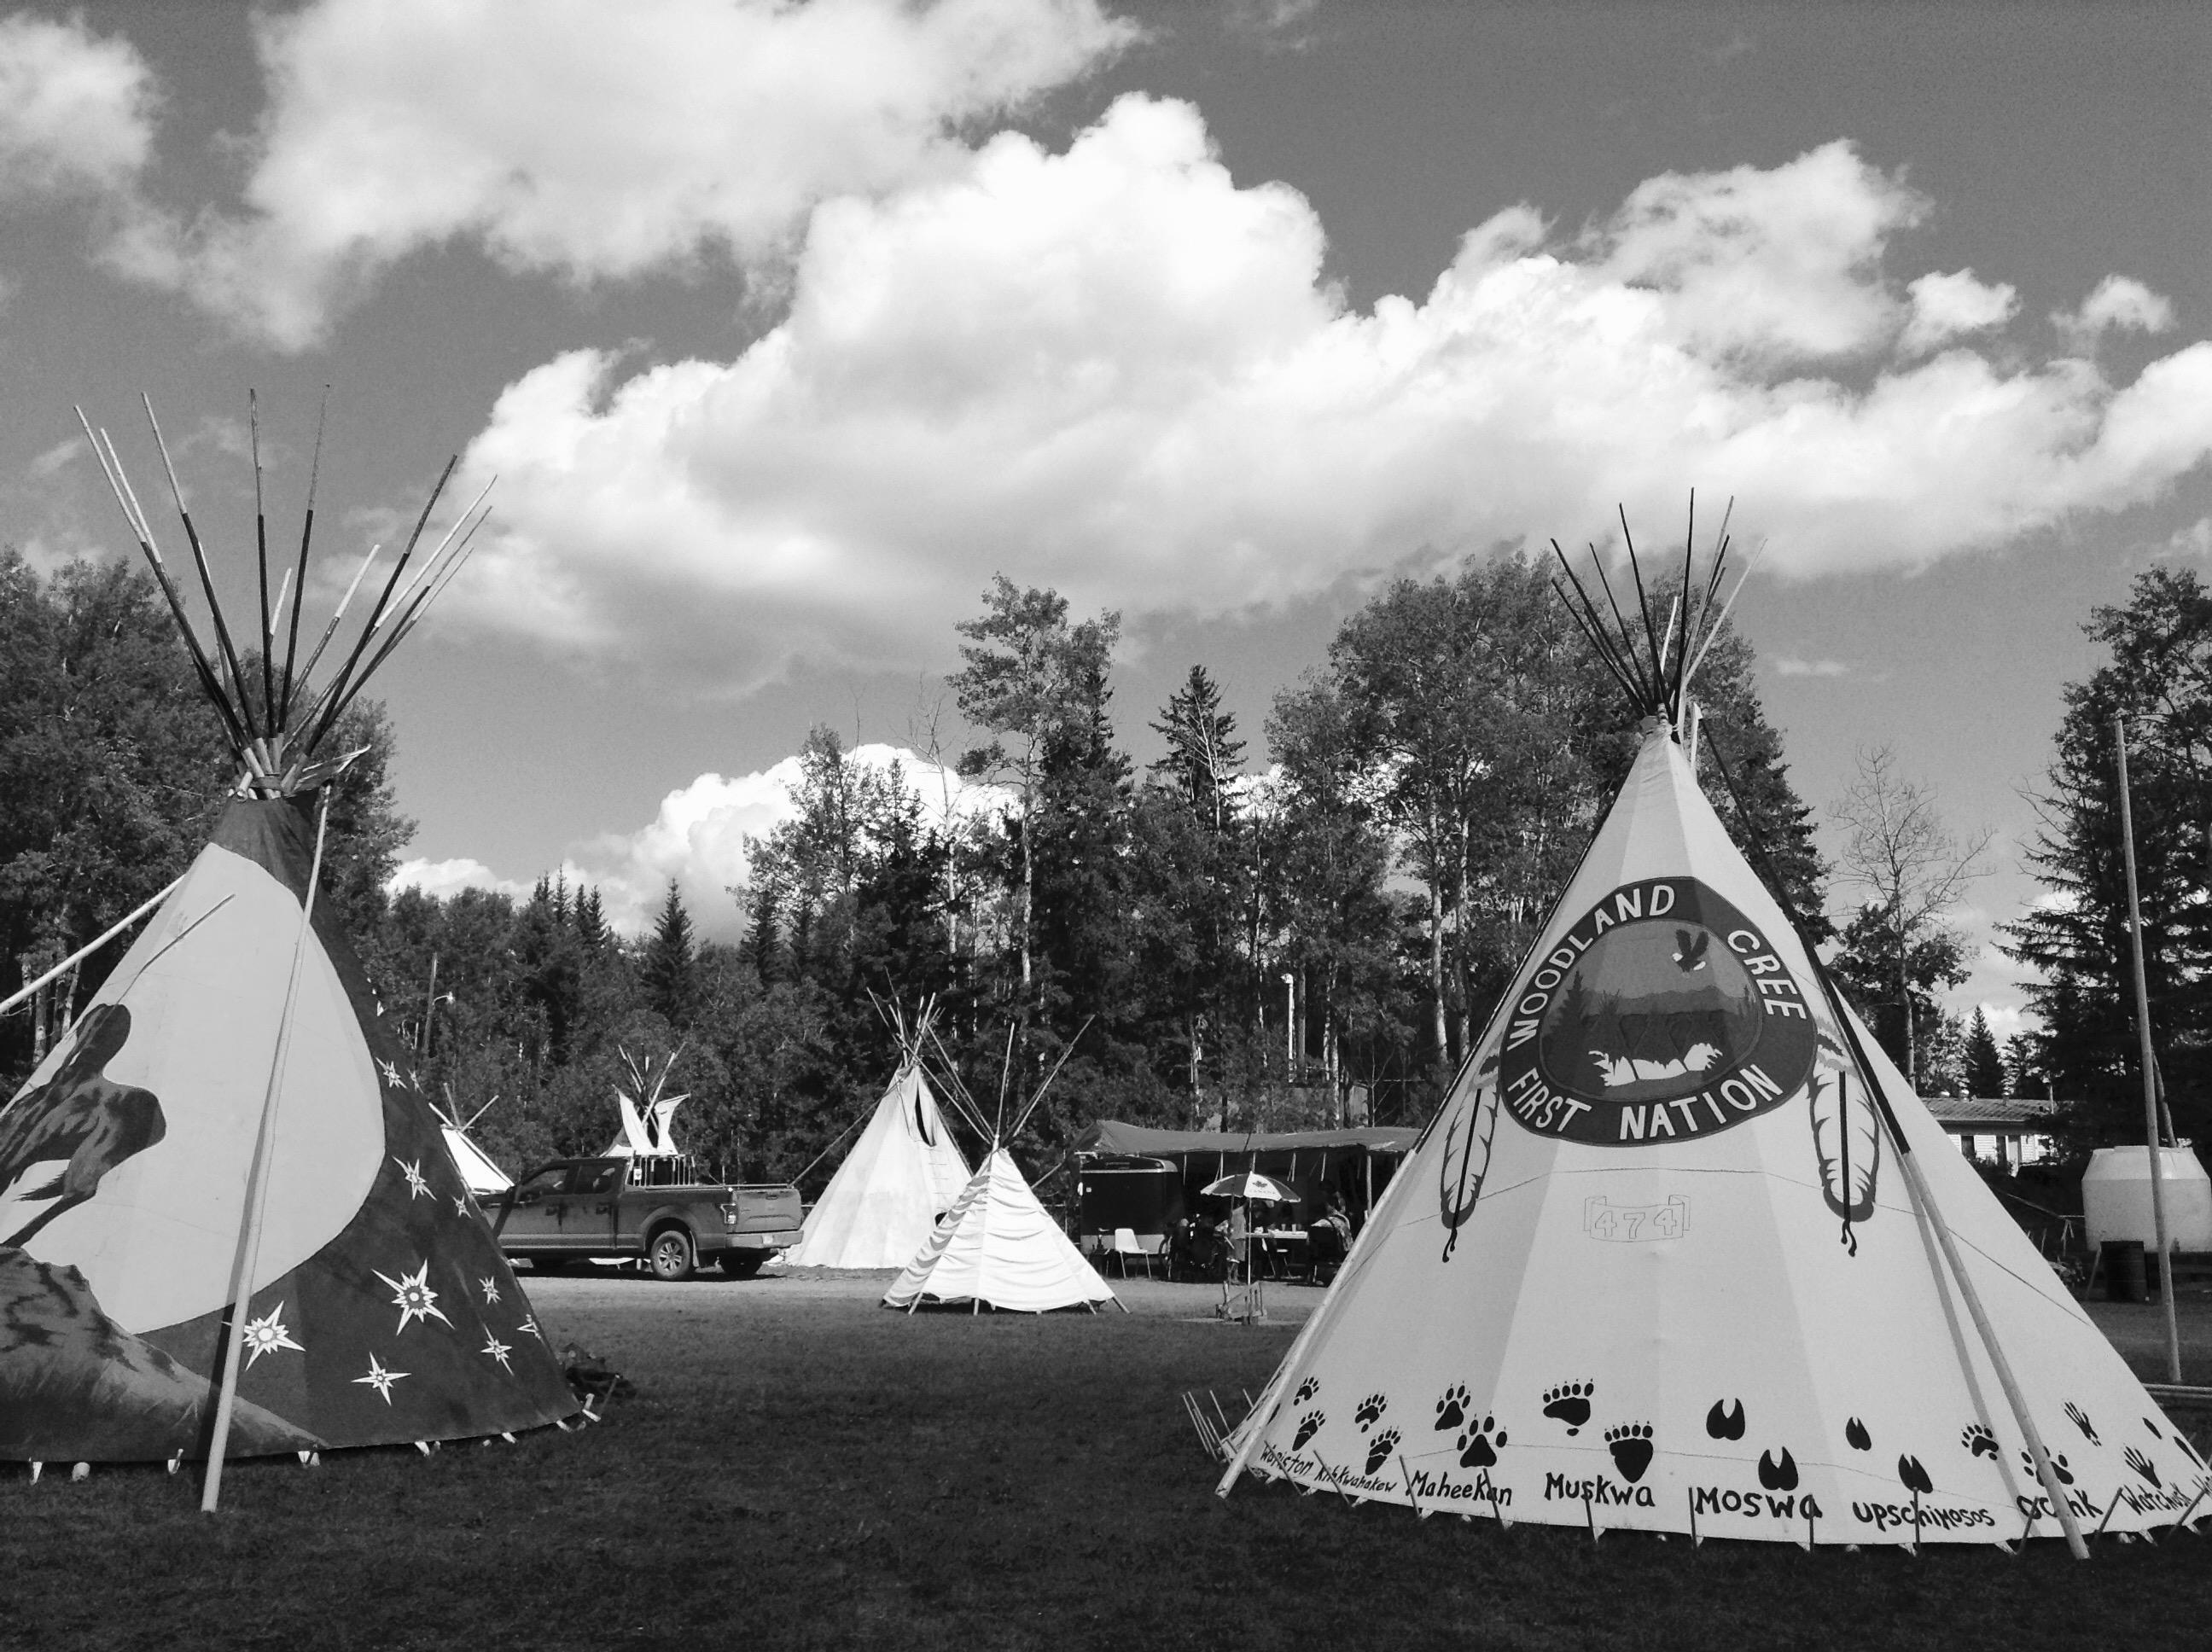 Tipi's set up for Treaty 8 Gathering